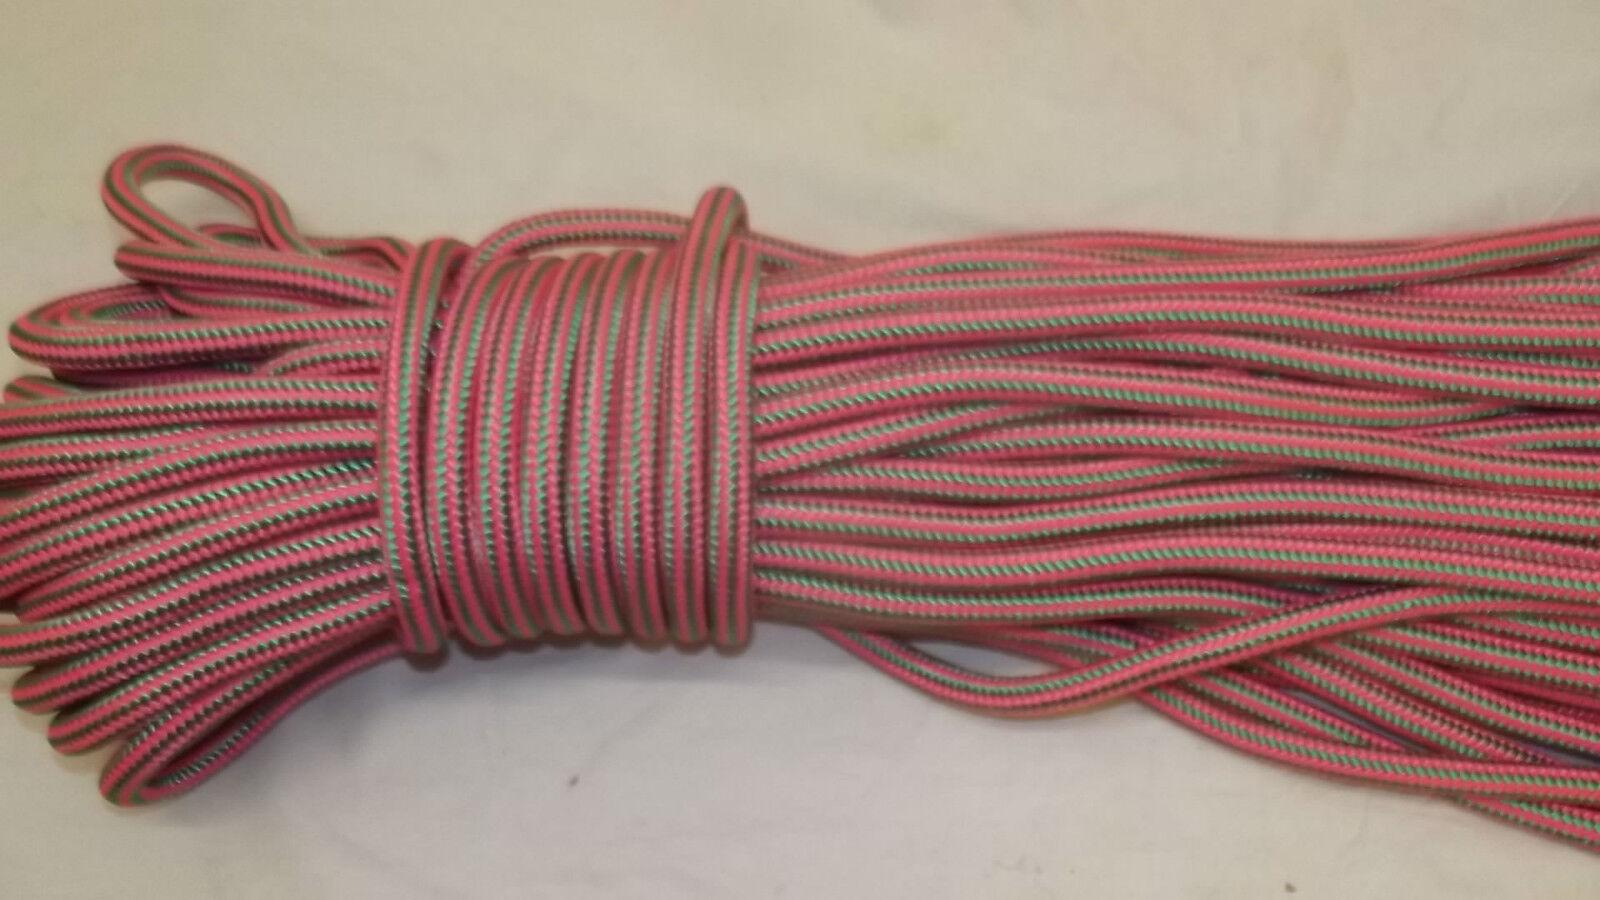 1  2  x 150' Double Braid Rope, Arborist Bull Rope, Rigging Line, Hoist Line, NEW  beautiful